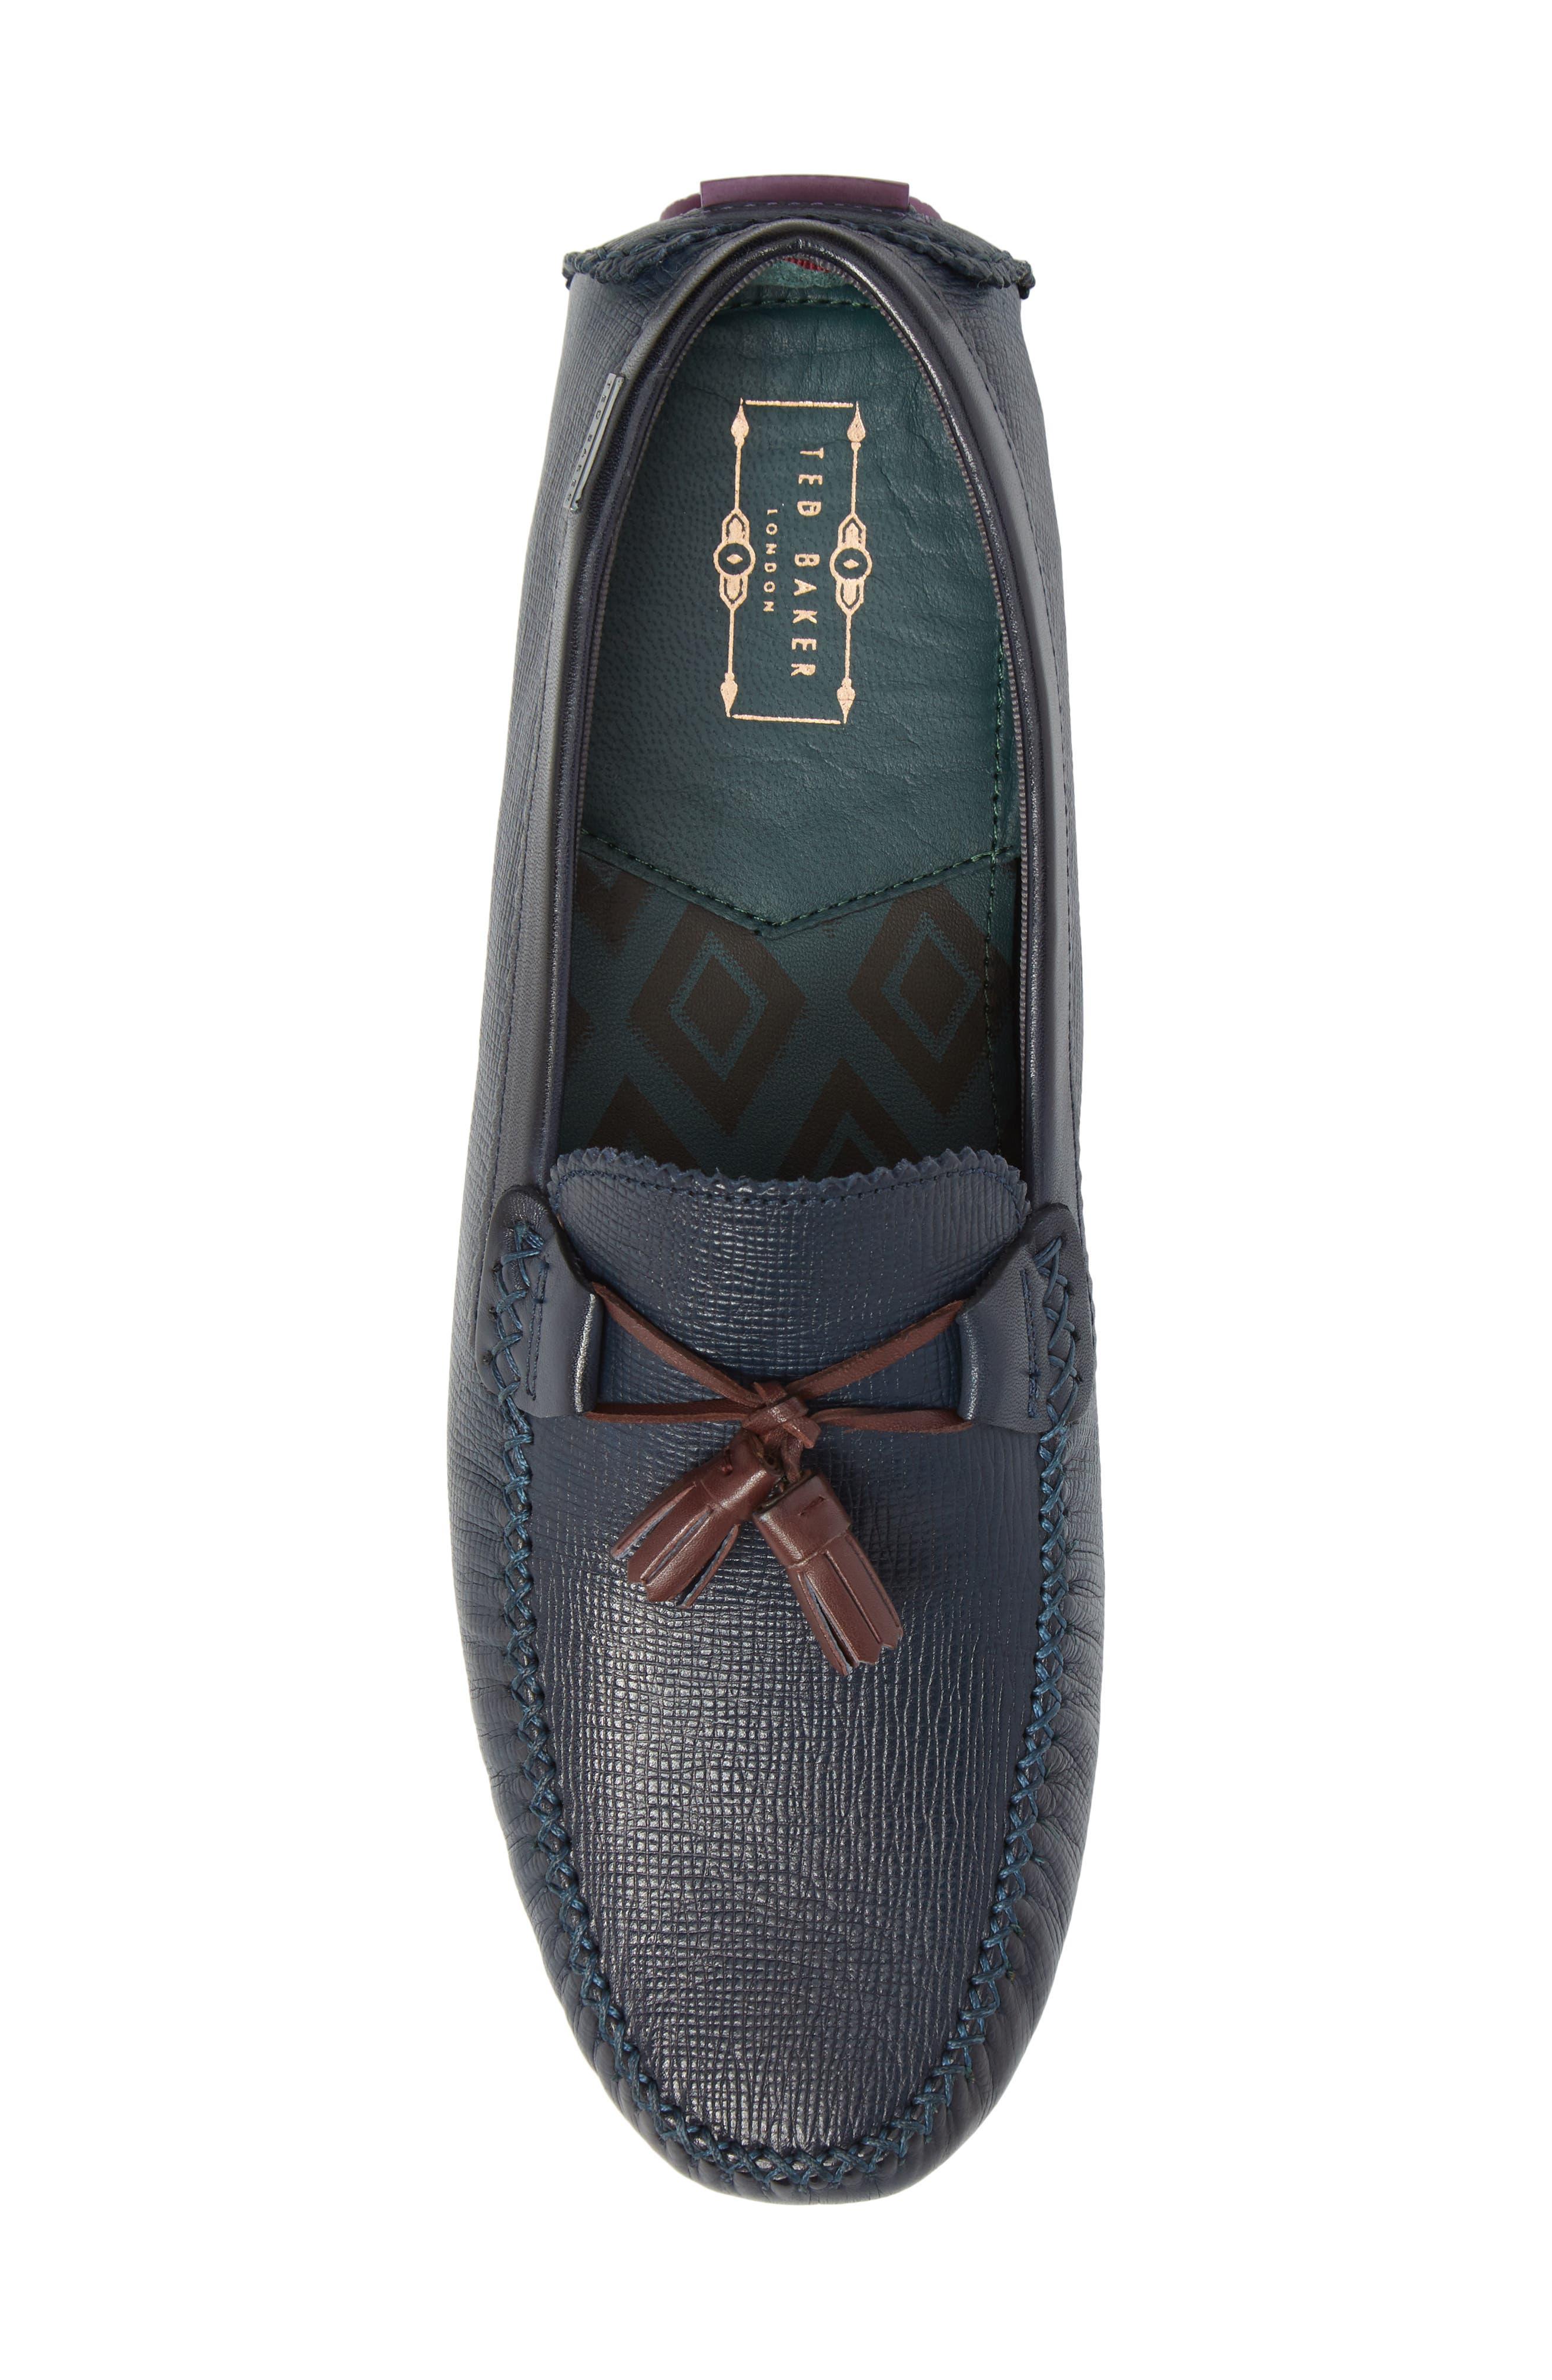 Urbonn Tasseled Driving Loafer,                             Alternate thumbnail 5, color,                             Dark Blue Leather